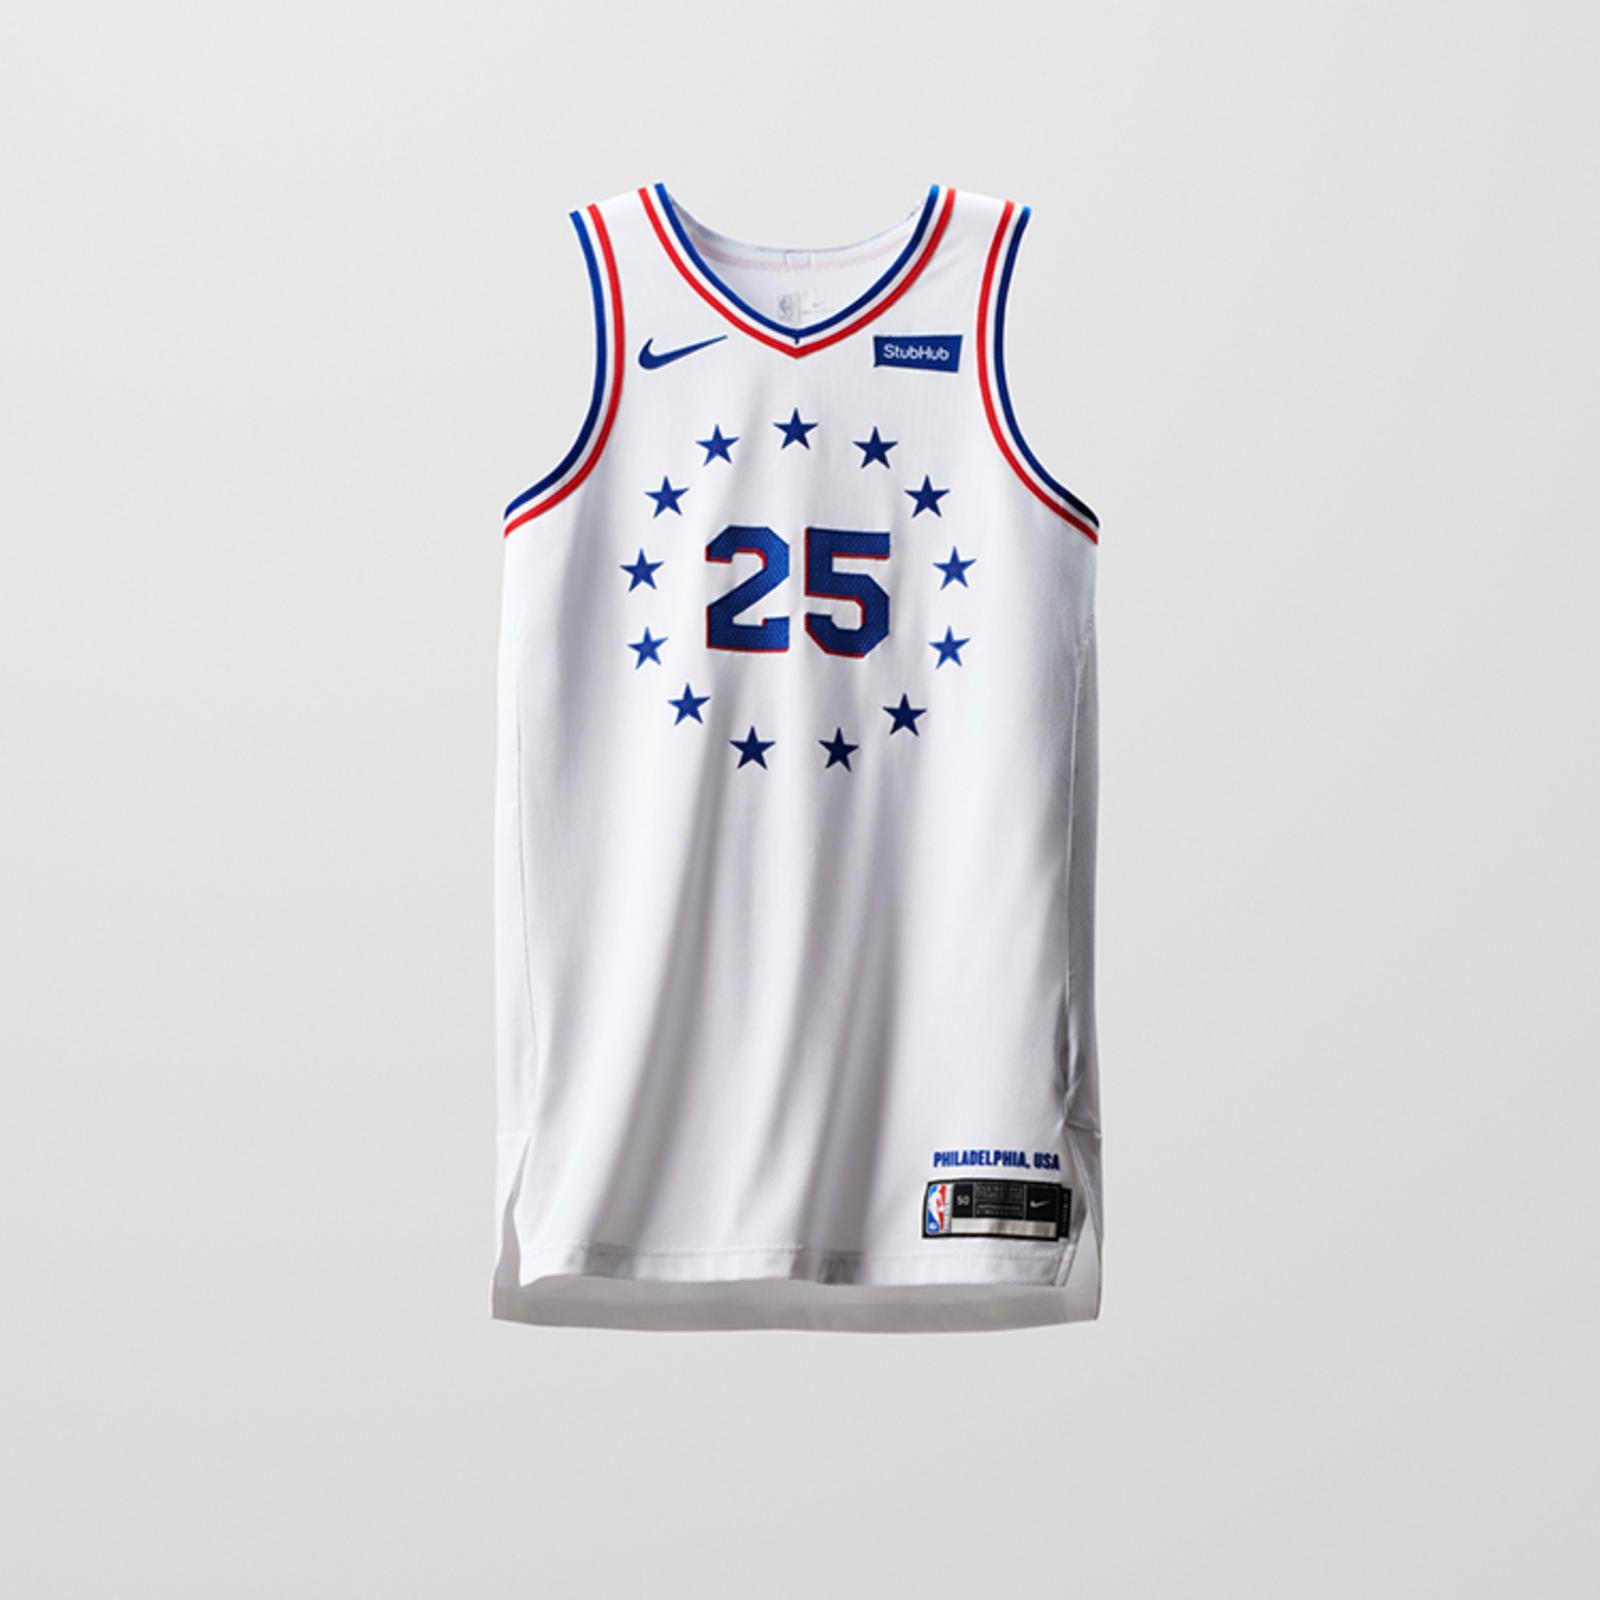 6f81bb1d240 Introducing the Nike NBA Earned Edition Uniforms | athletics | Nba ...